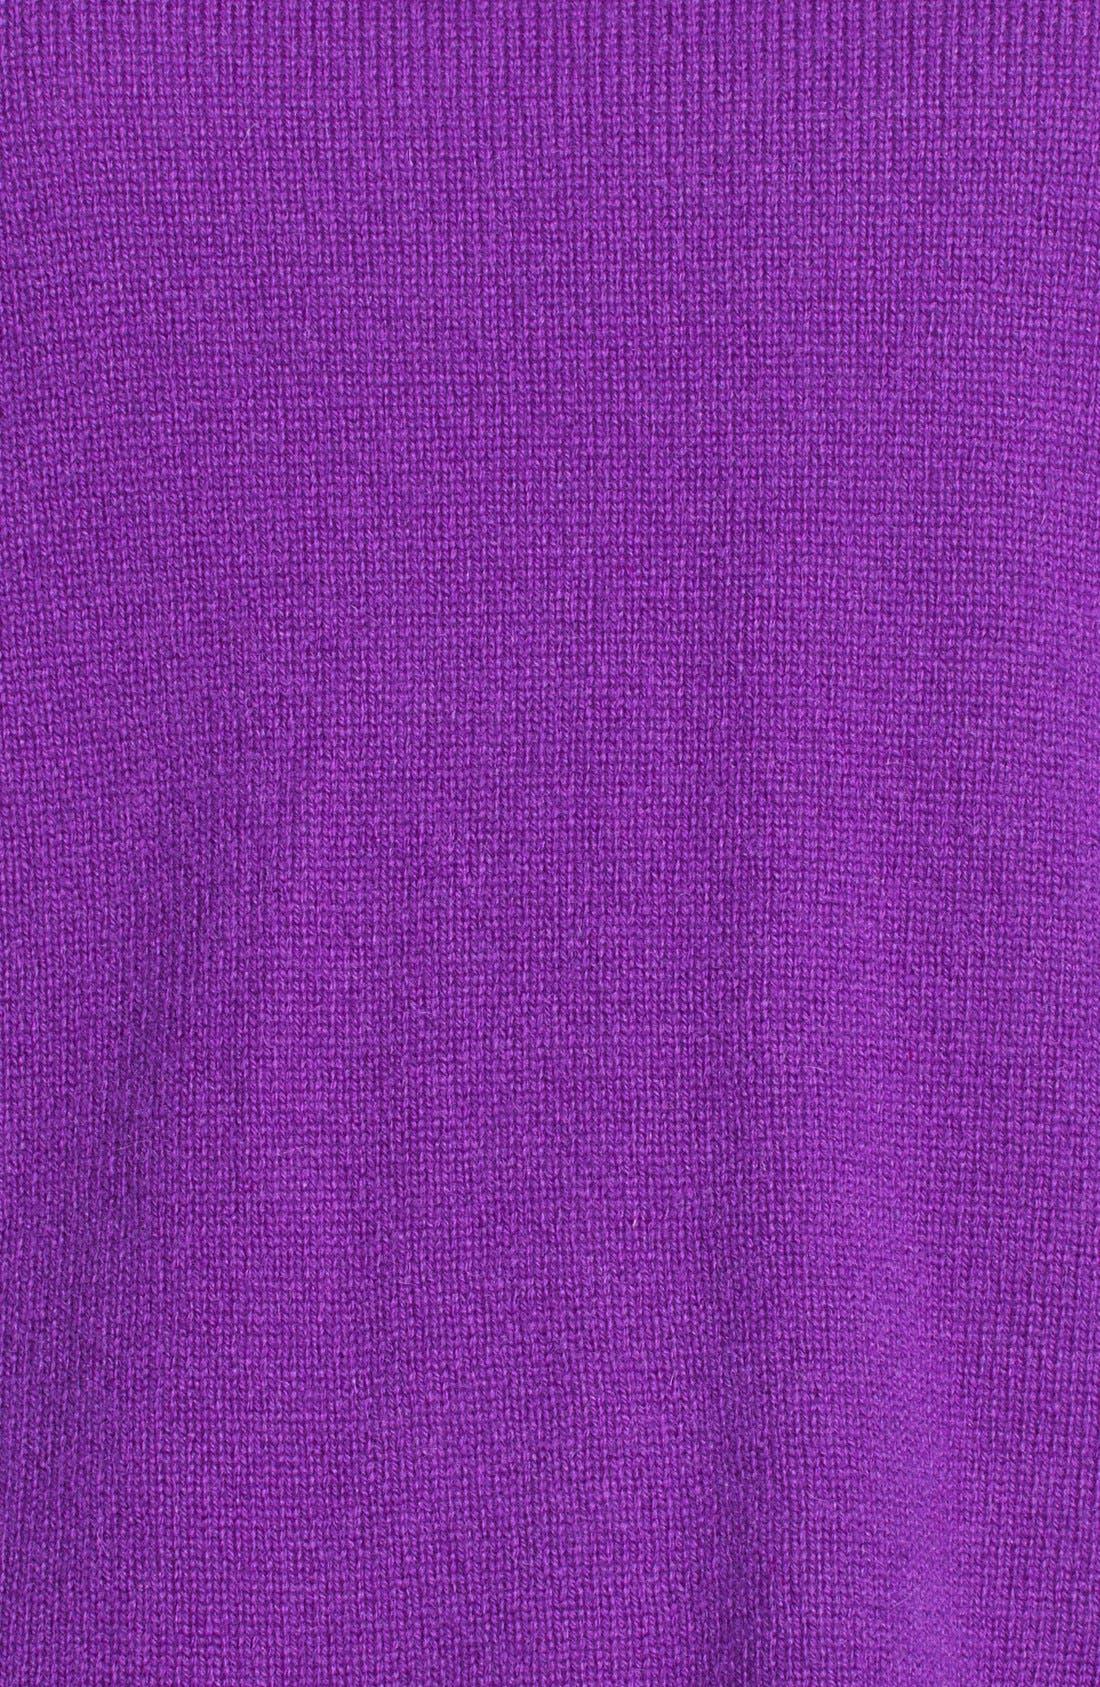 Alternate Image 3  - Halogen® Wool & Cashmere Back Zip Sweater (Petite)